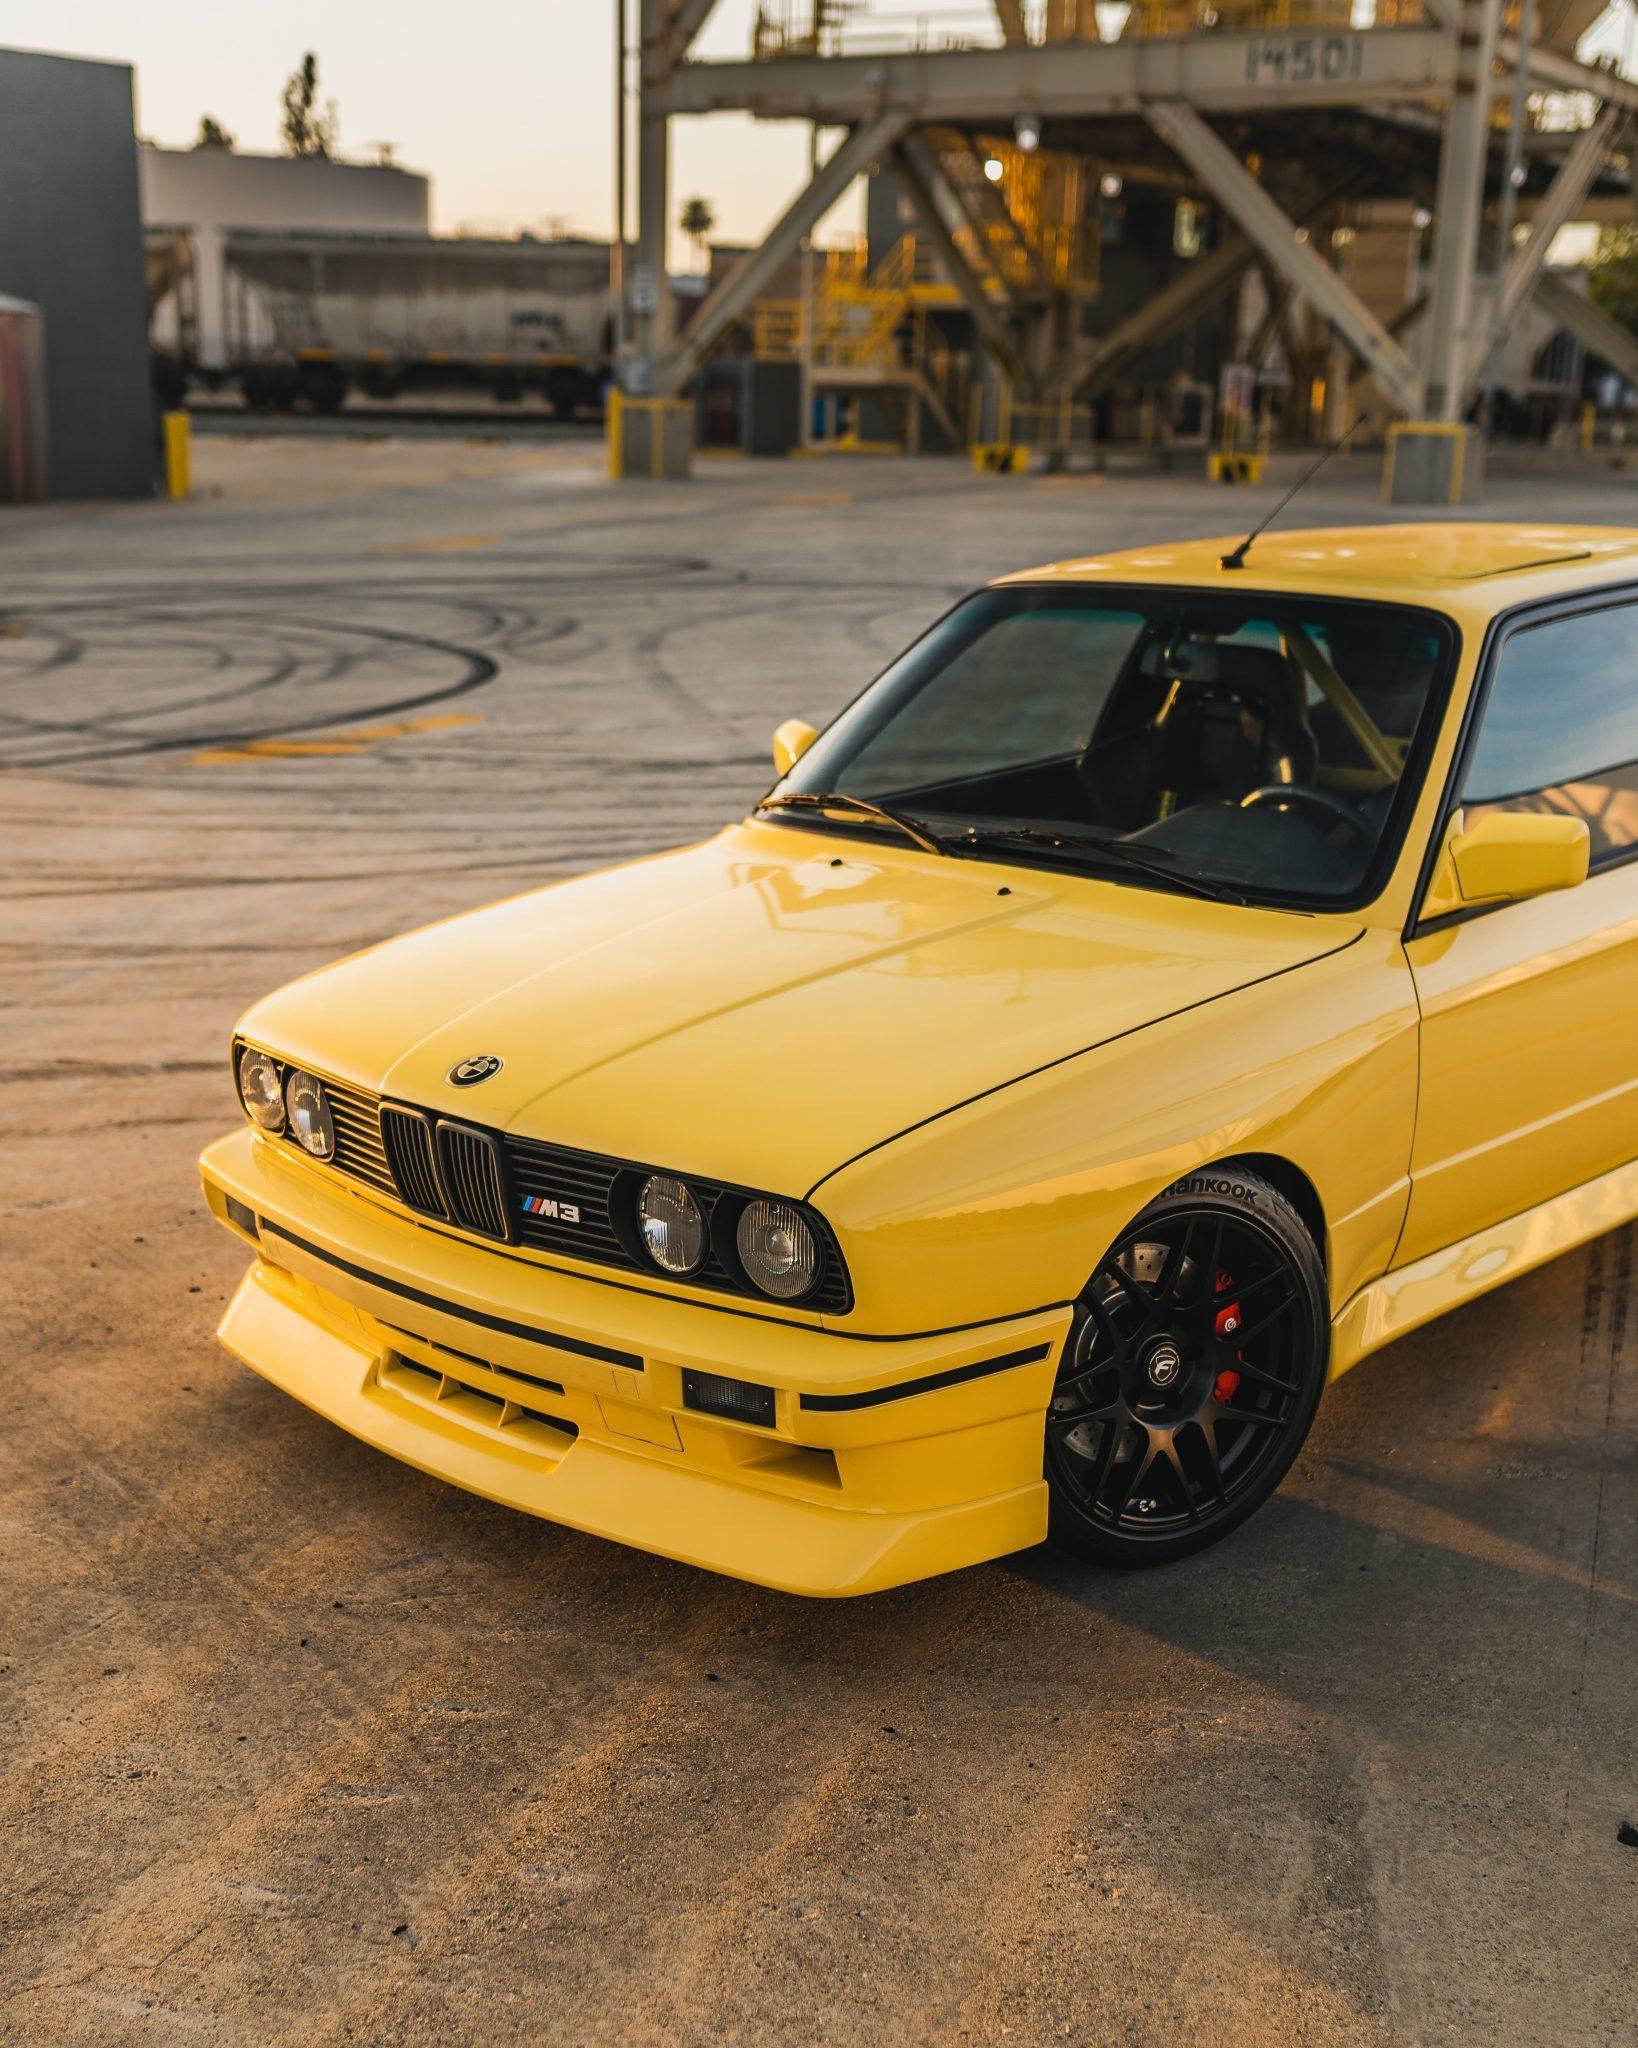 S50-Powered_1989_BMW_M3_0005